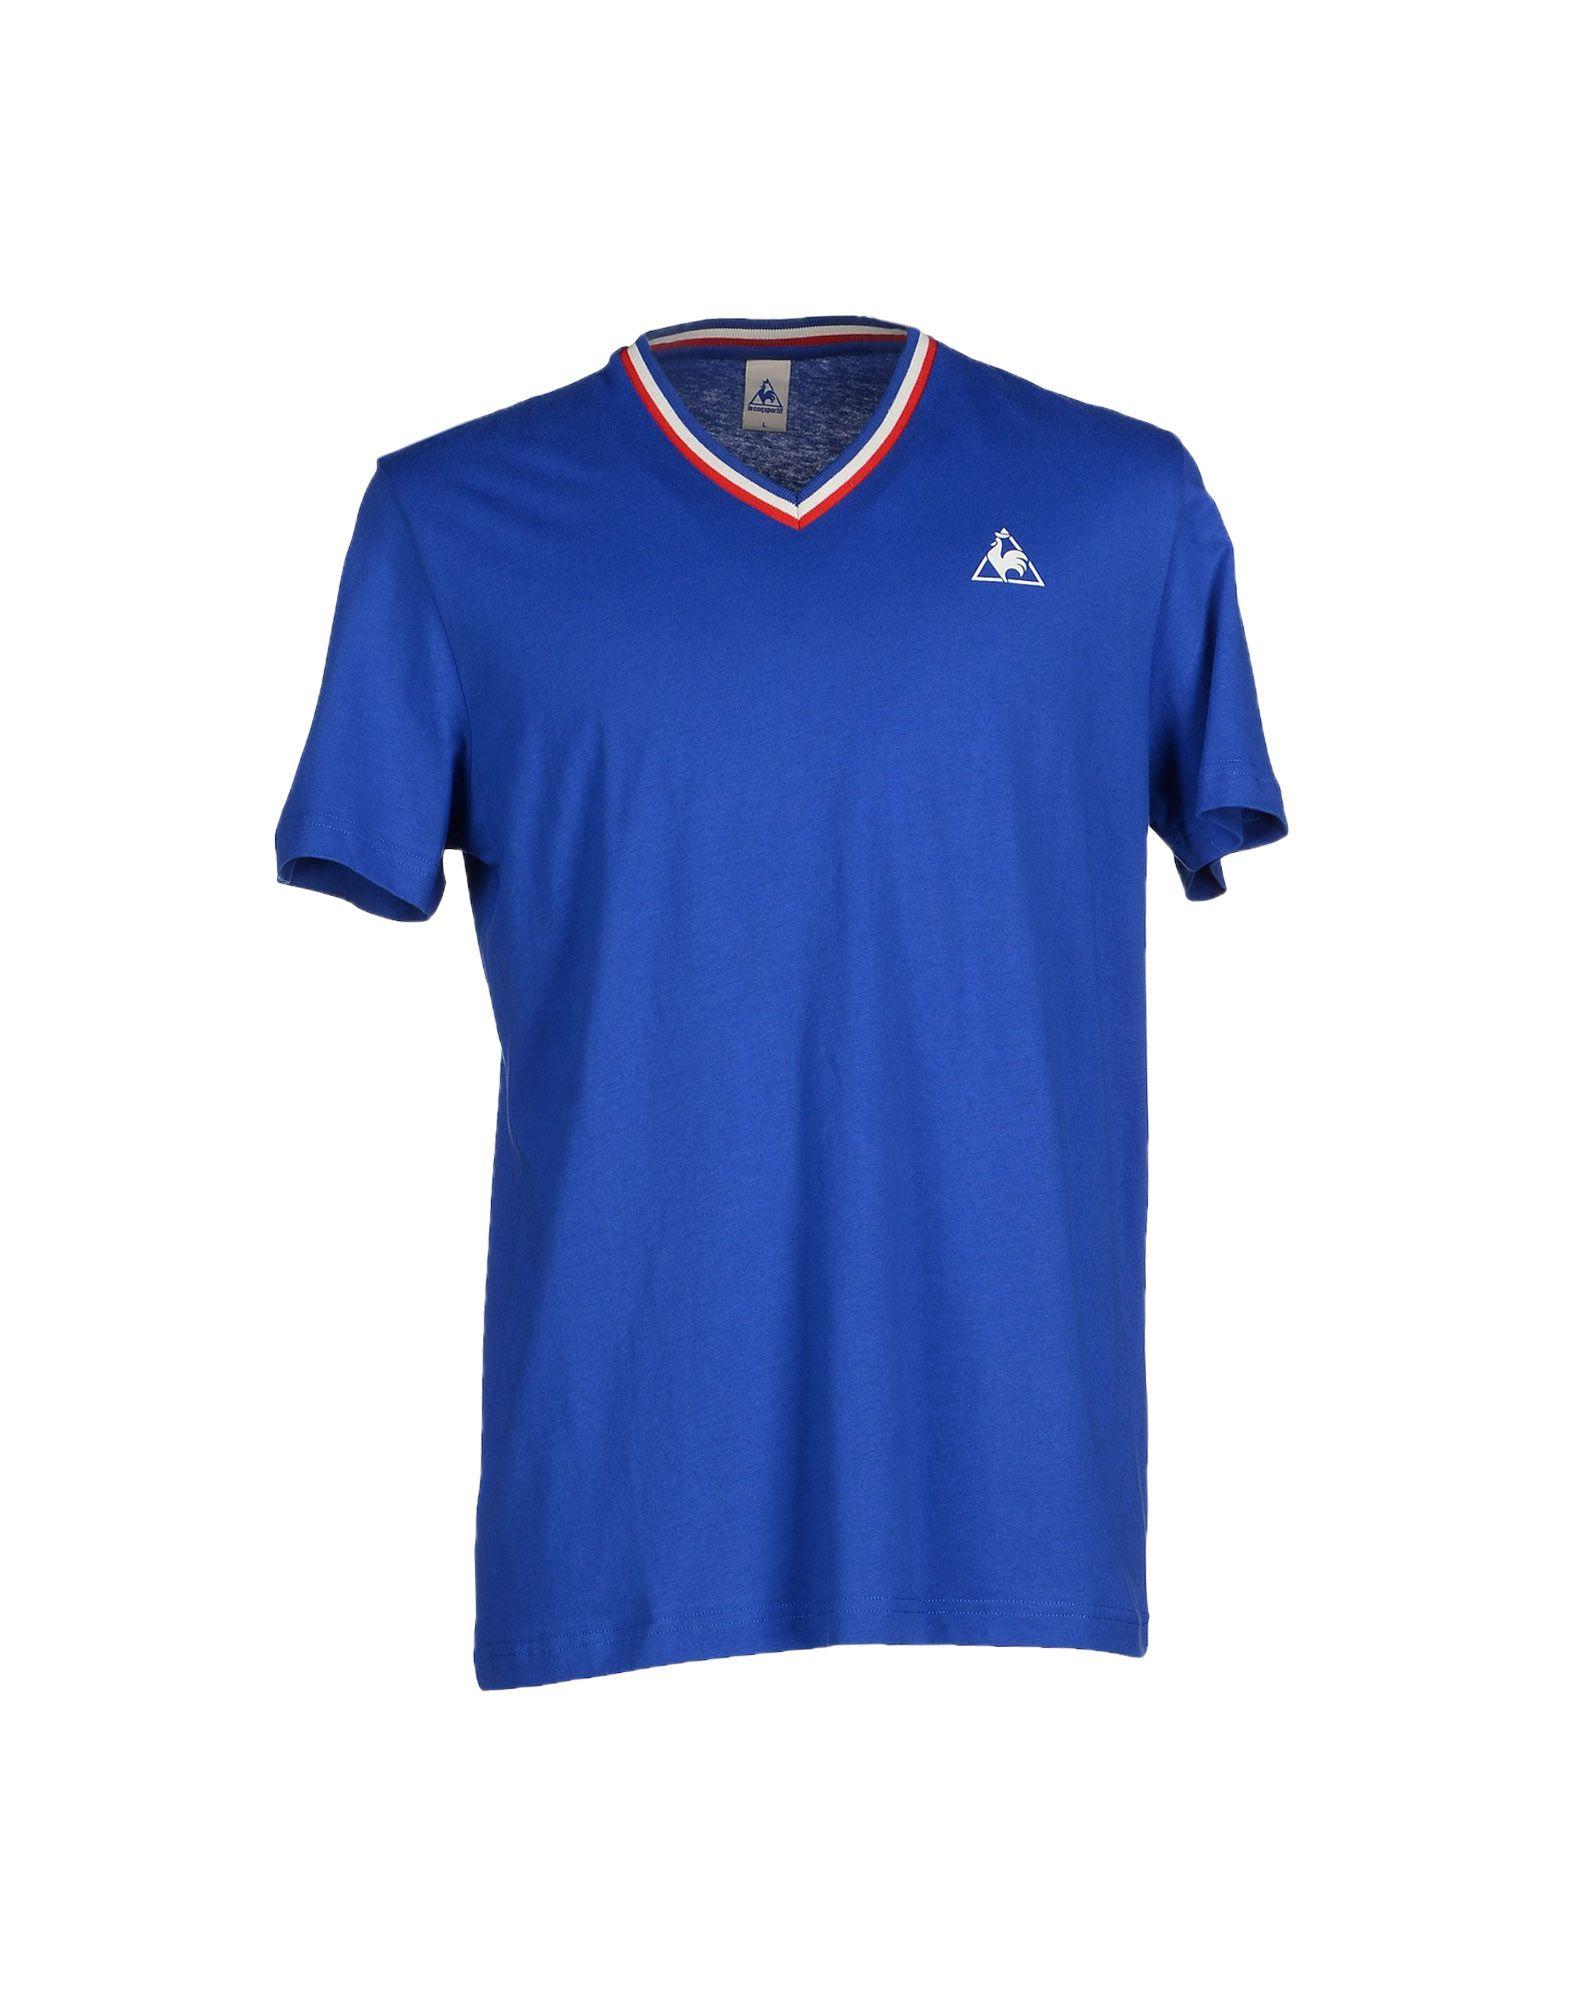 le coq sportif shirt - photo #5